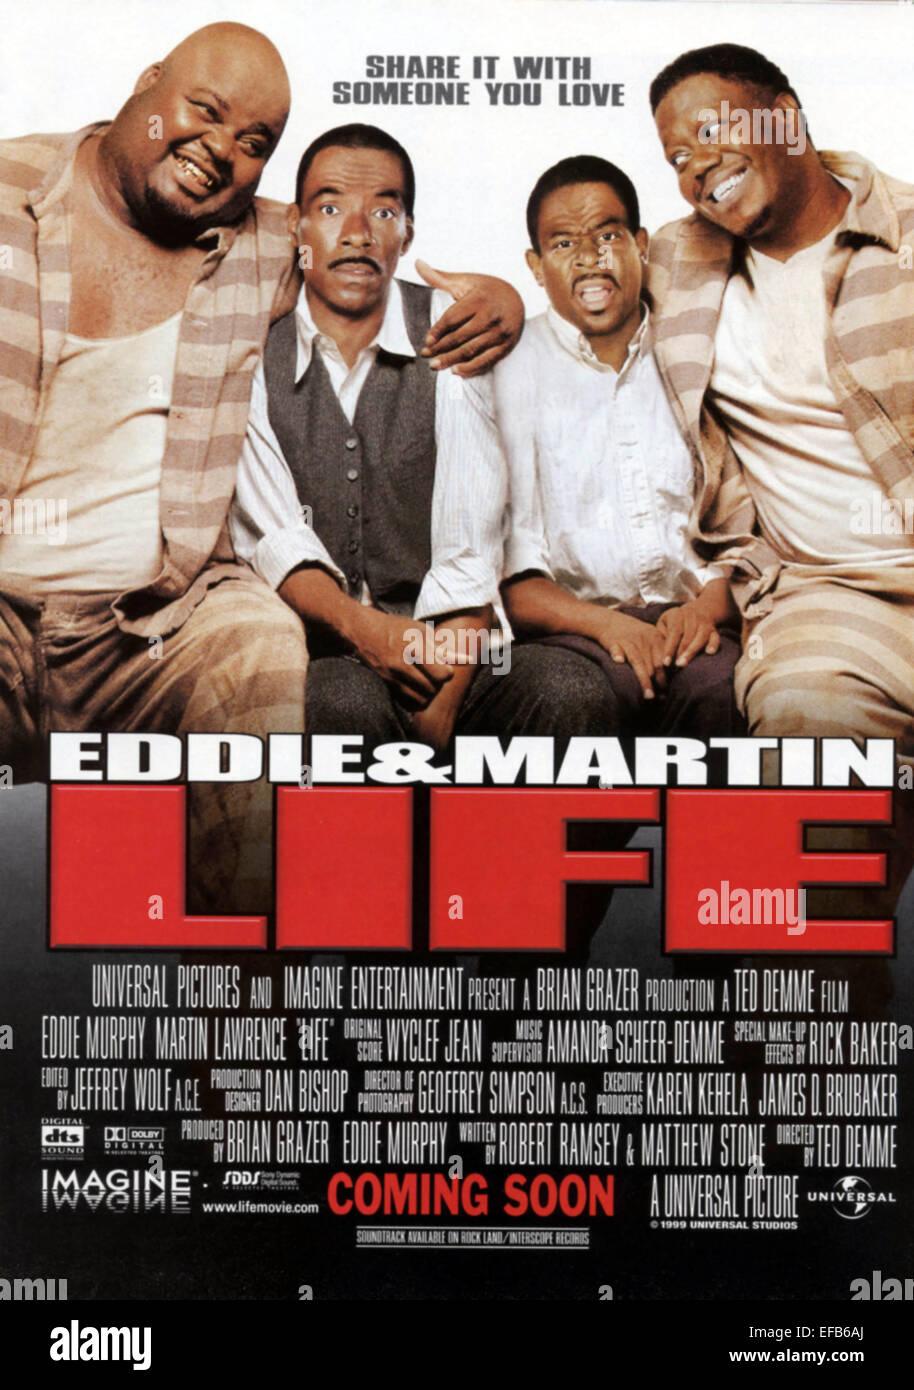 life movie eddie murphy full movie